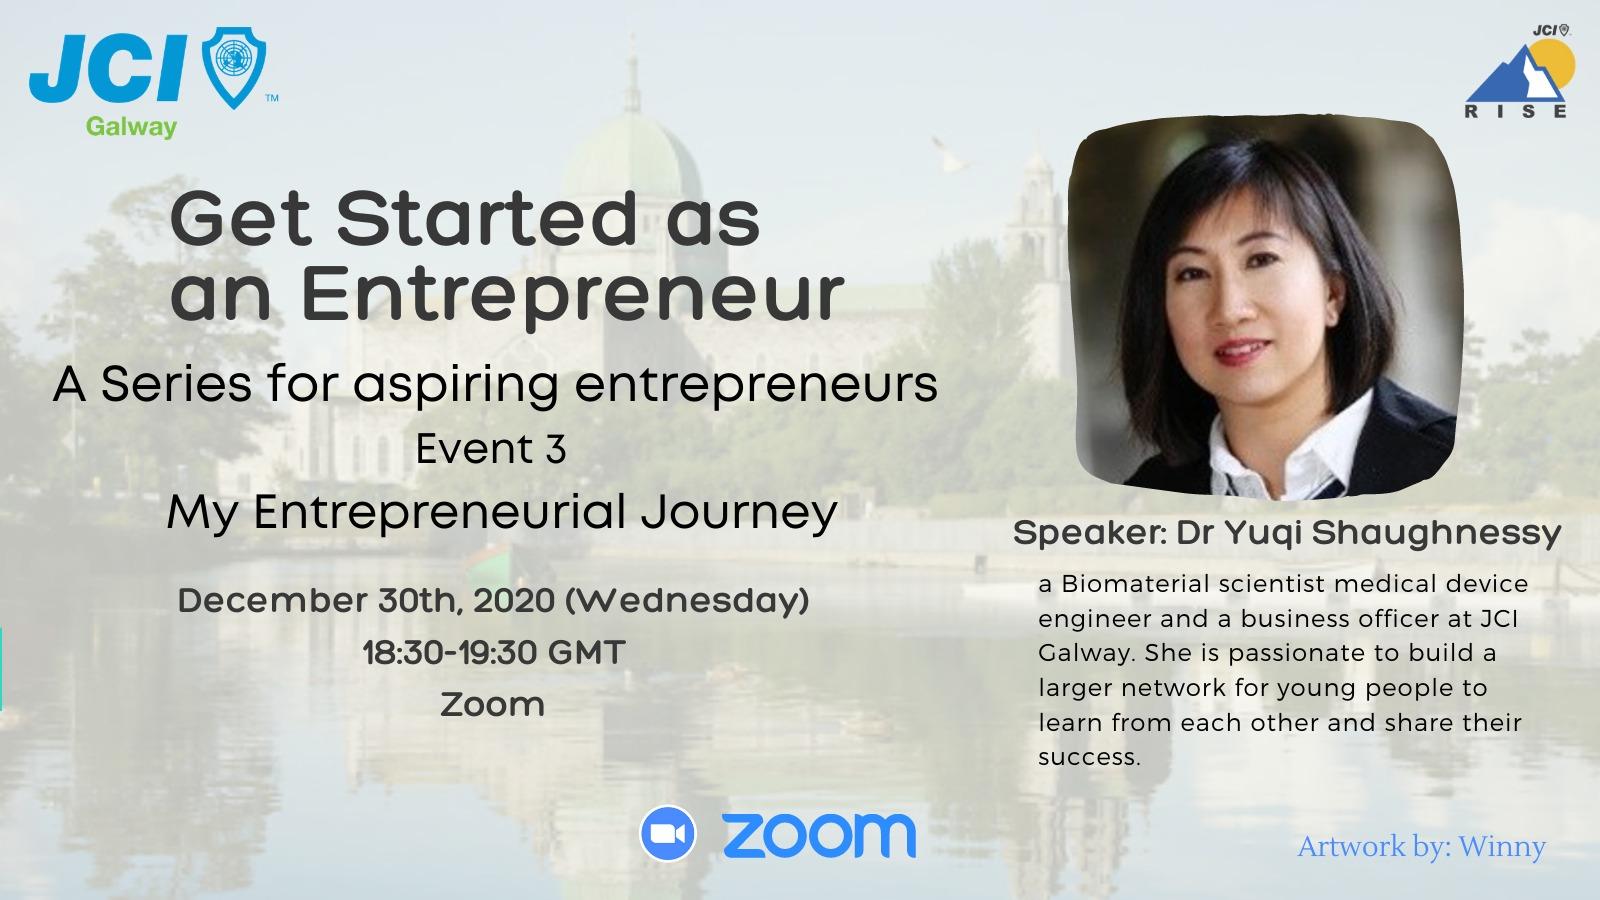 Get Started as an Entrepreneur Series - 3 - My Entrepreneurial Journey